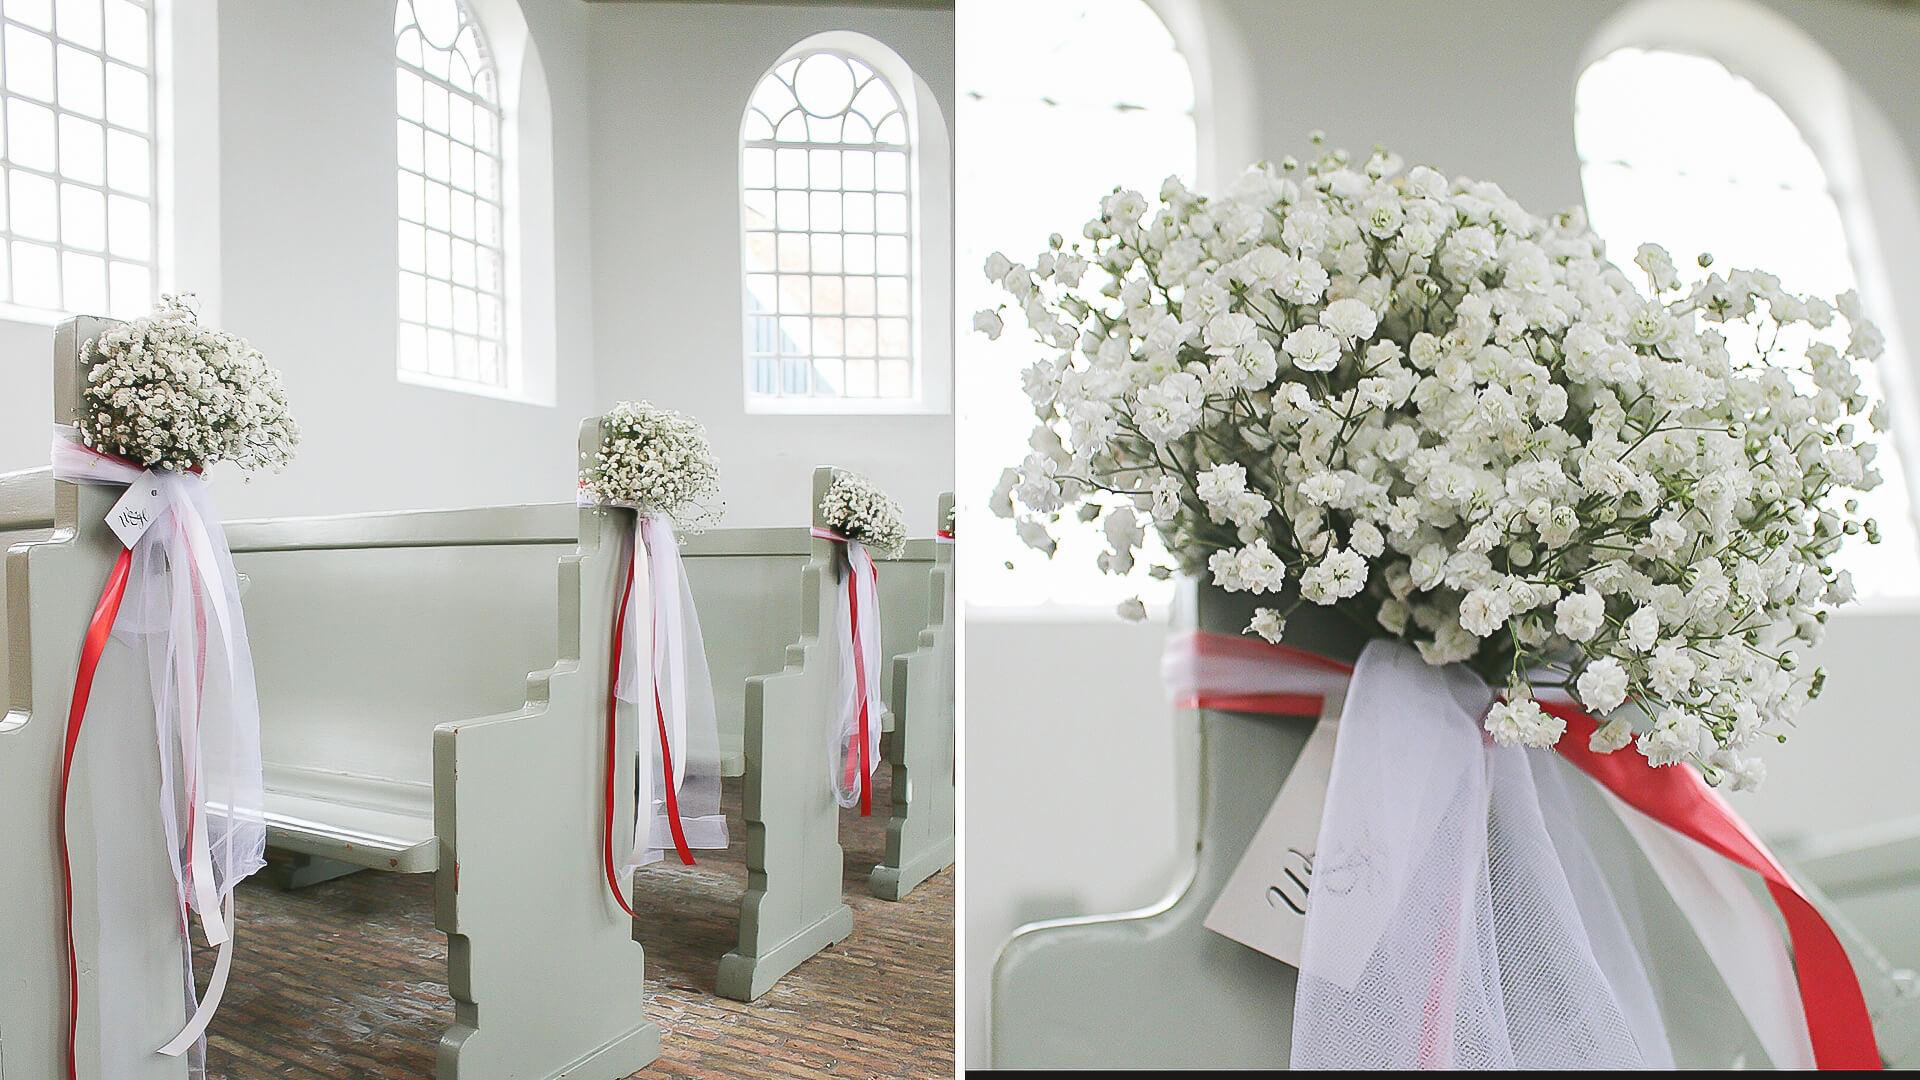 Lijn 10, trouwen, trouwboeket, bruidswerk, bruidsboeket, gipskruid, locatie styling, trouwstyling, fotografie, lijn 10, Zuidhorn